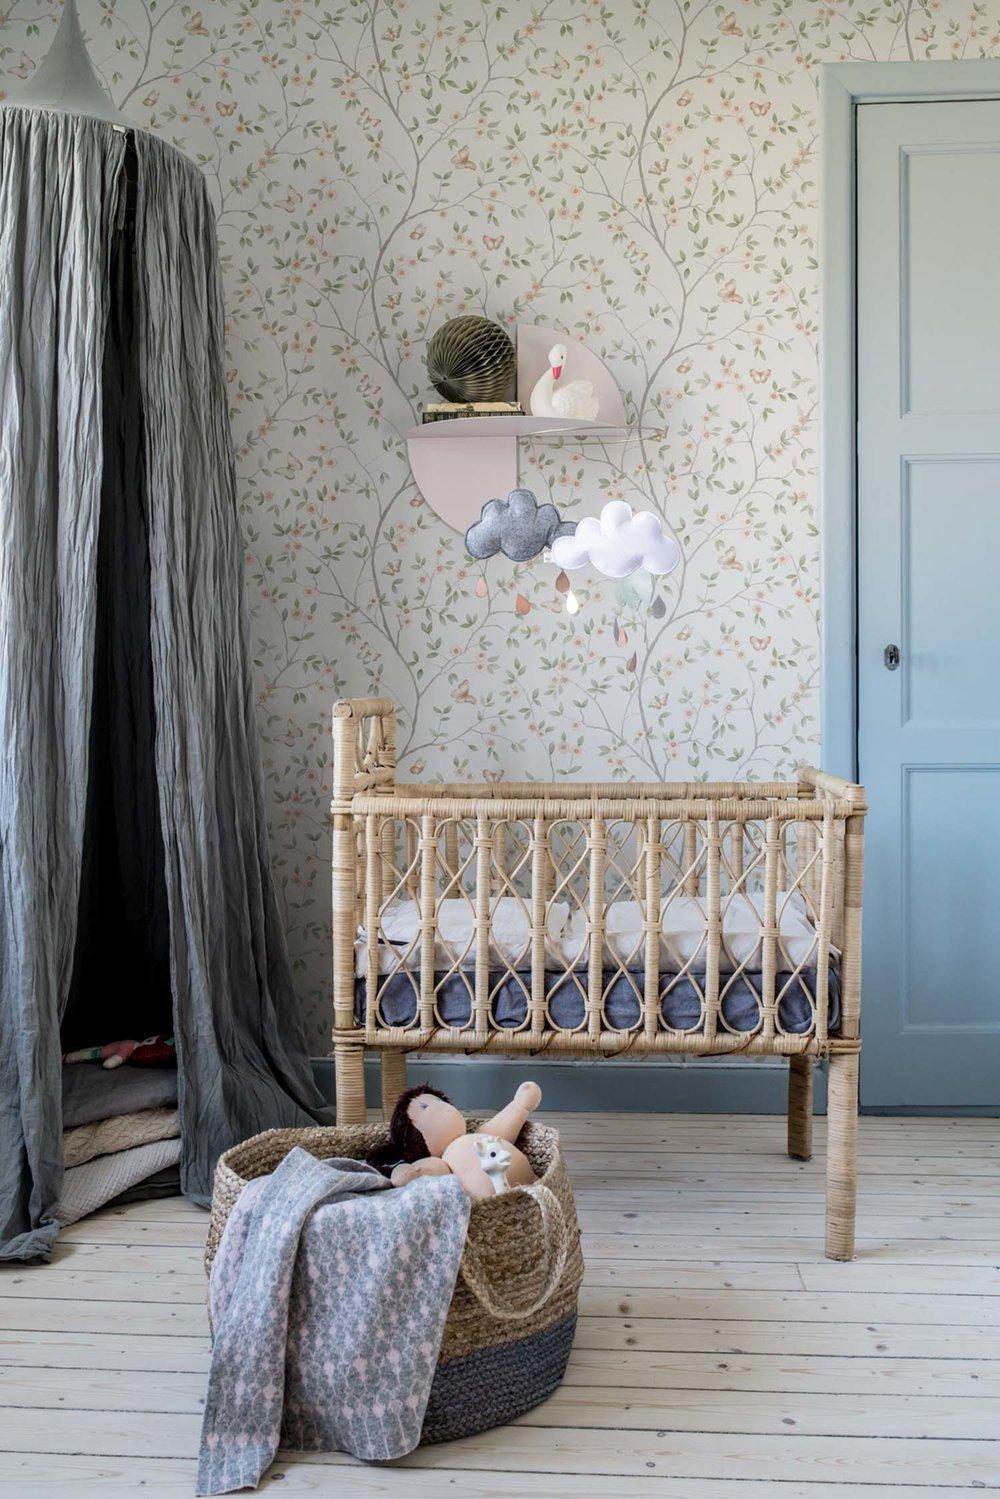 2018 baby nursery inspiration \u2014 winter daisy interiors for childrenBaby Nursery Inspiration #6